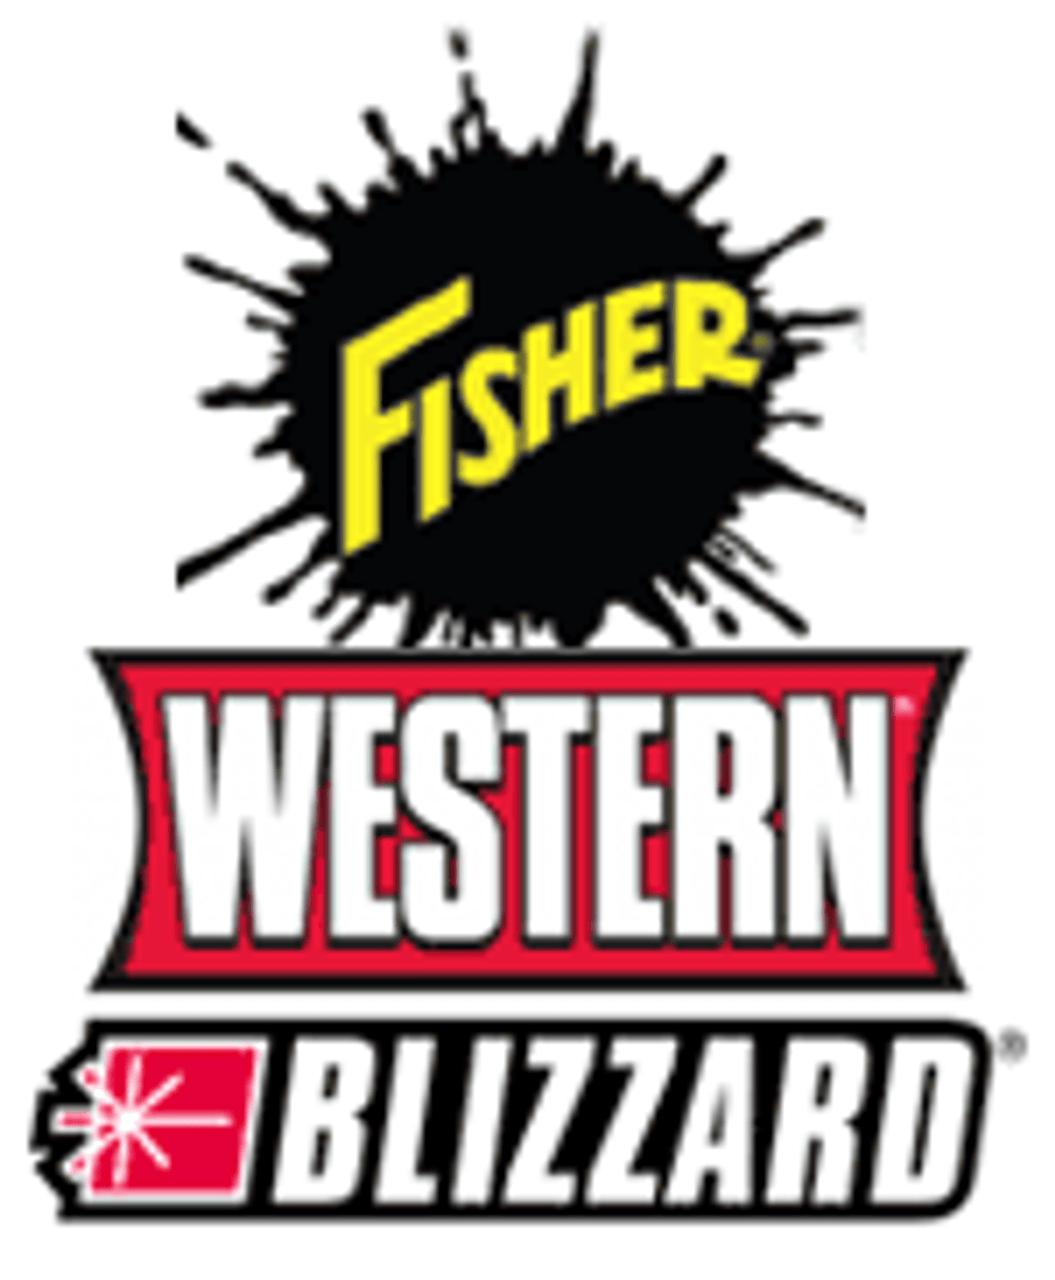 "21316 - ""FISHER - WESTERN - BLIZZARD - SNOWEX  1/2-13X1-1/4 HX CS G5 W/HANDLE"